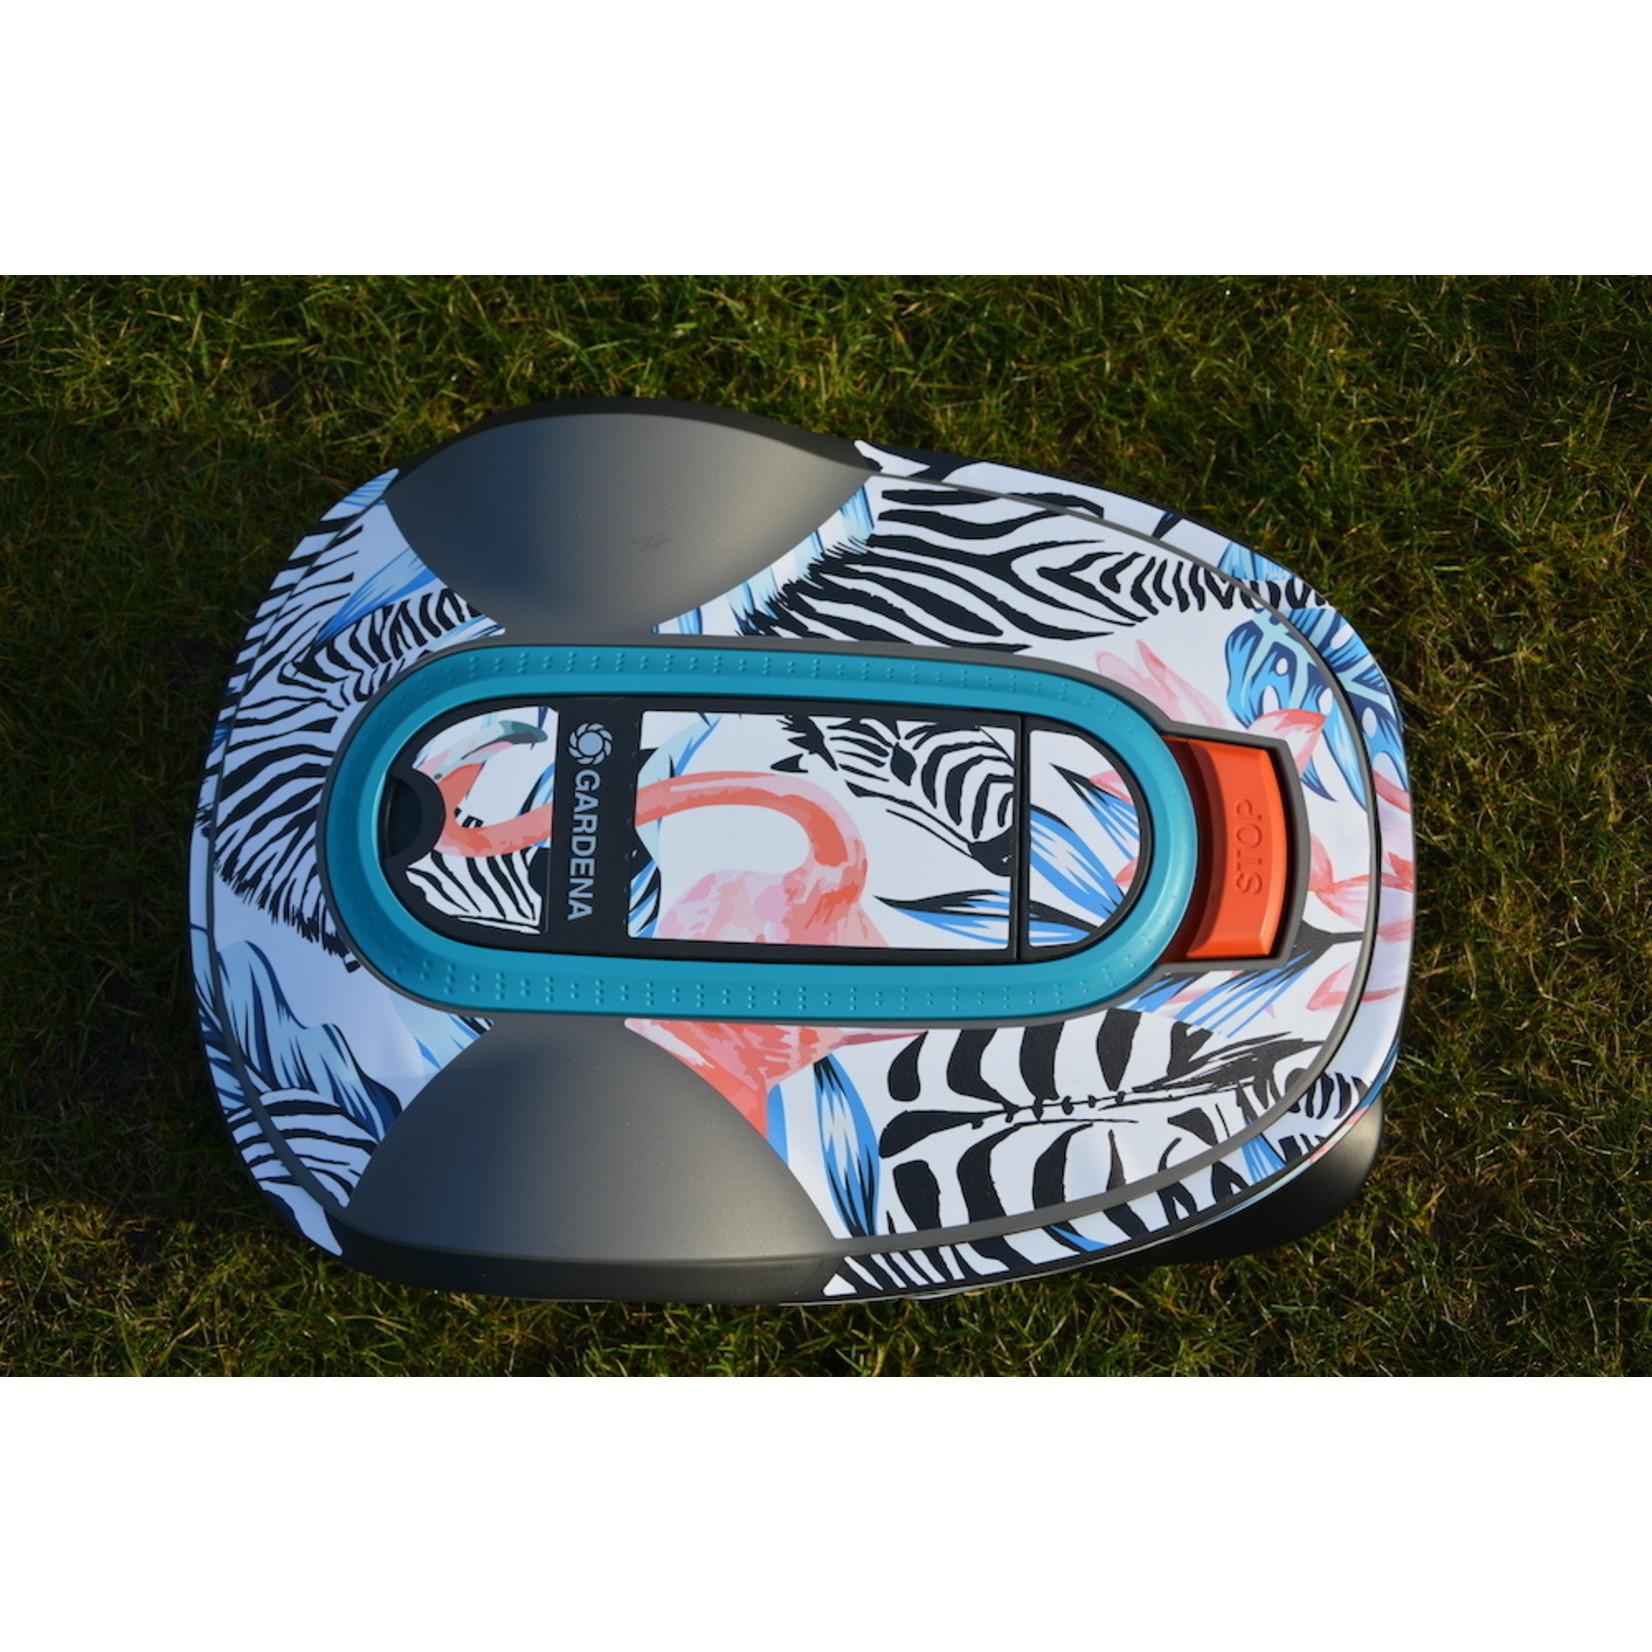 Twinckels Twinckels robotmaaier stickerset (Gardena Sileno) - Zebra